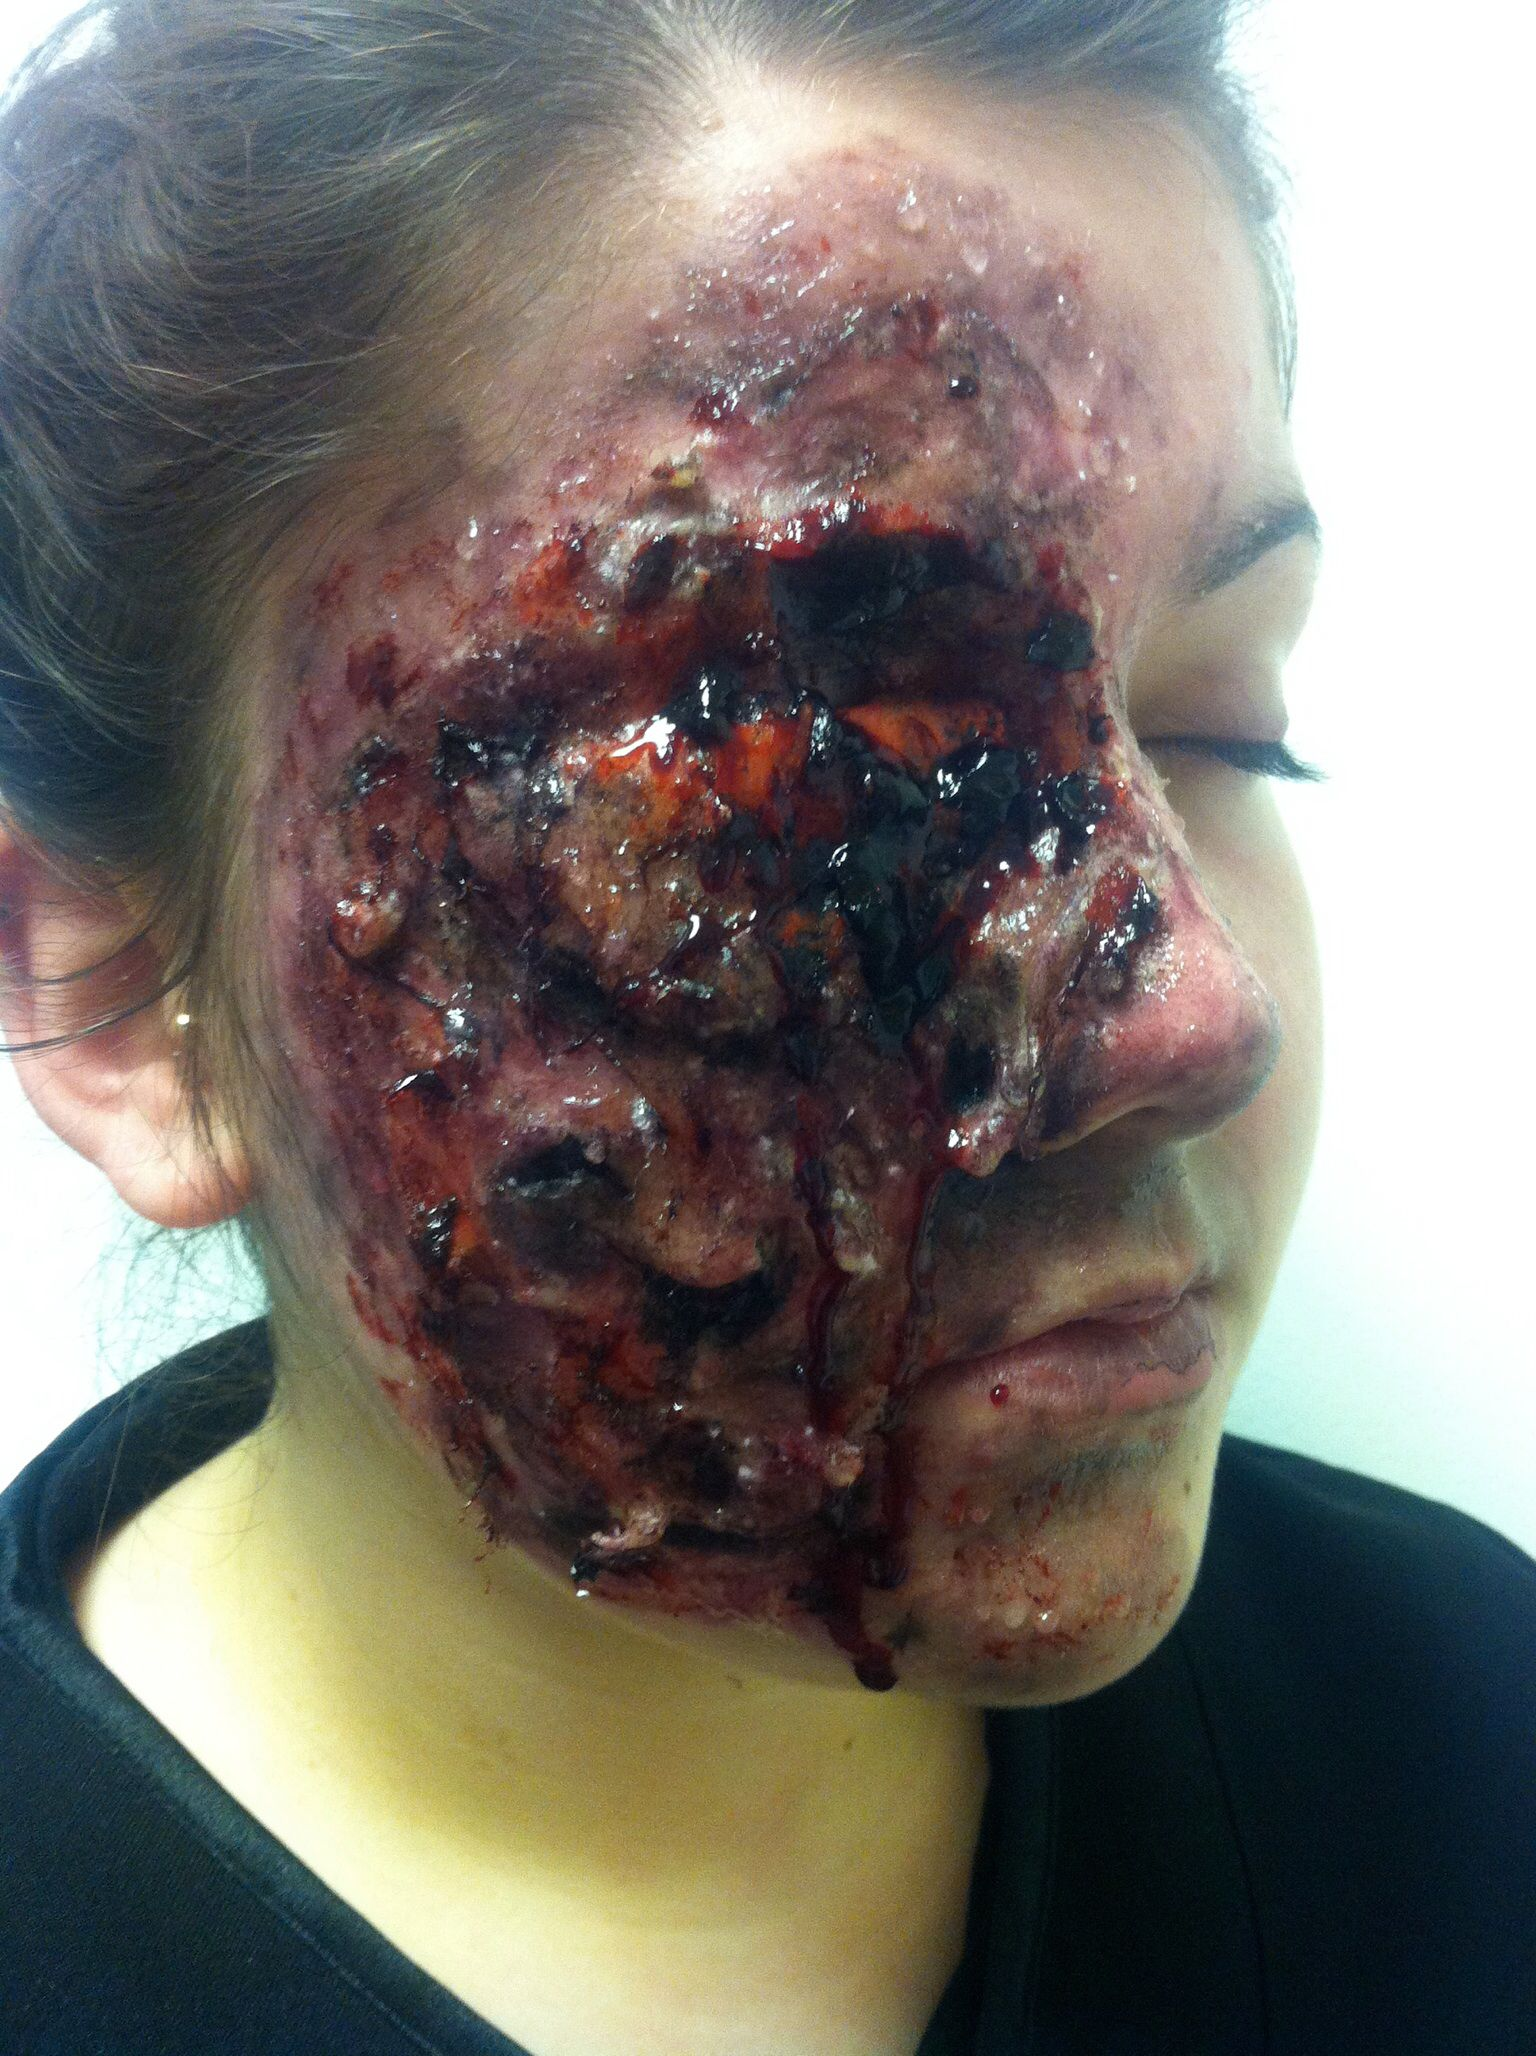 Fatal Third Degree Fire Burns | Theatrical makeup, Media ...